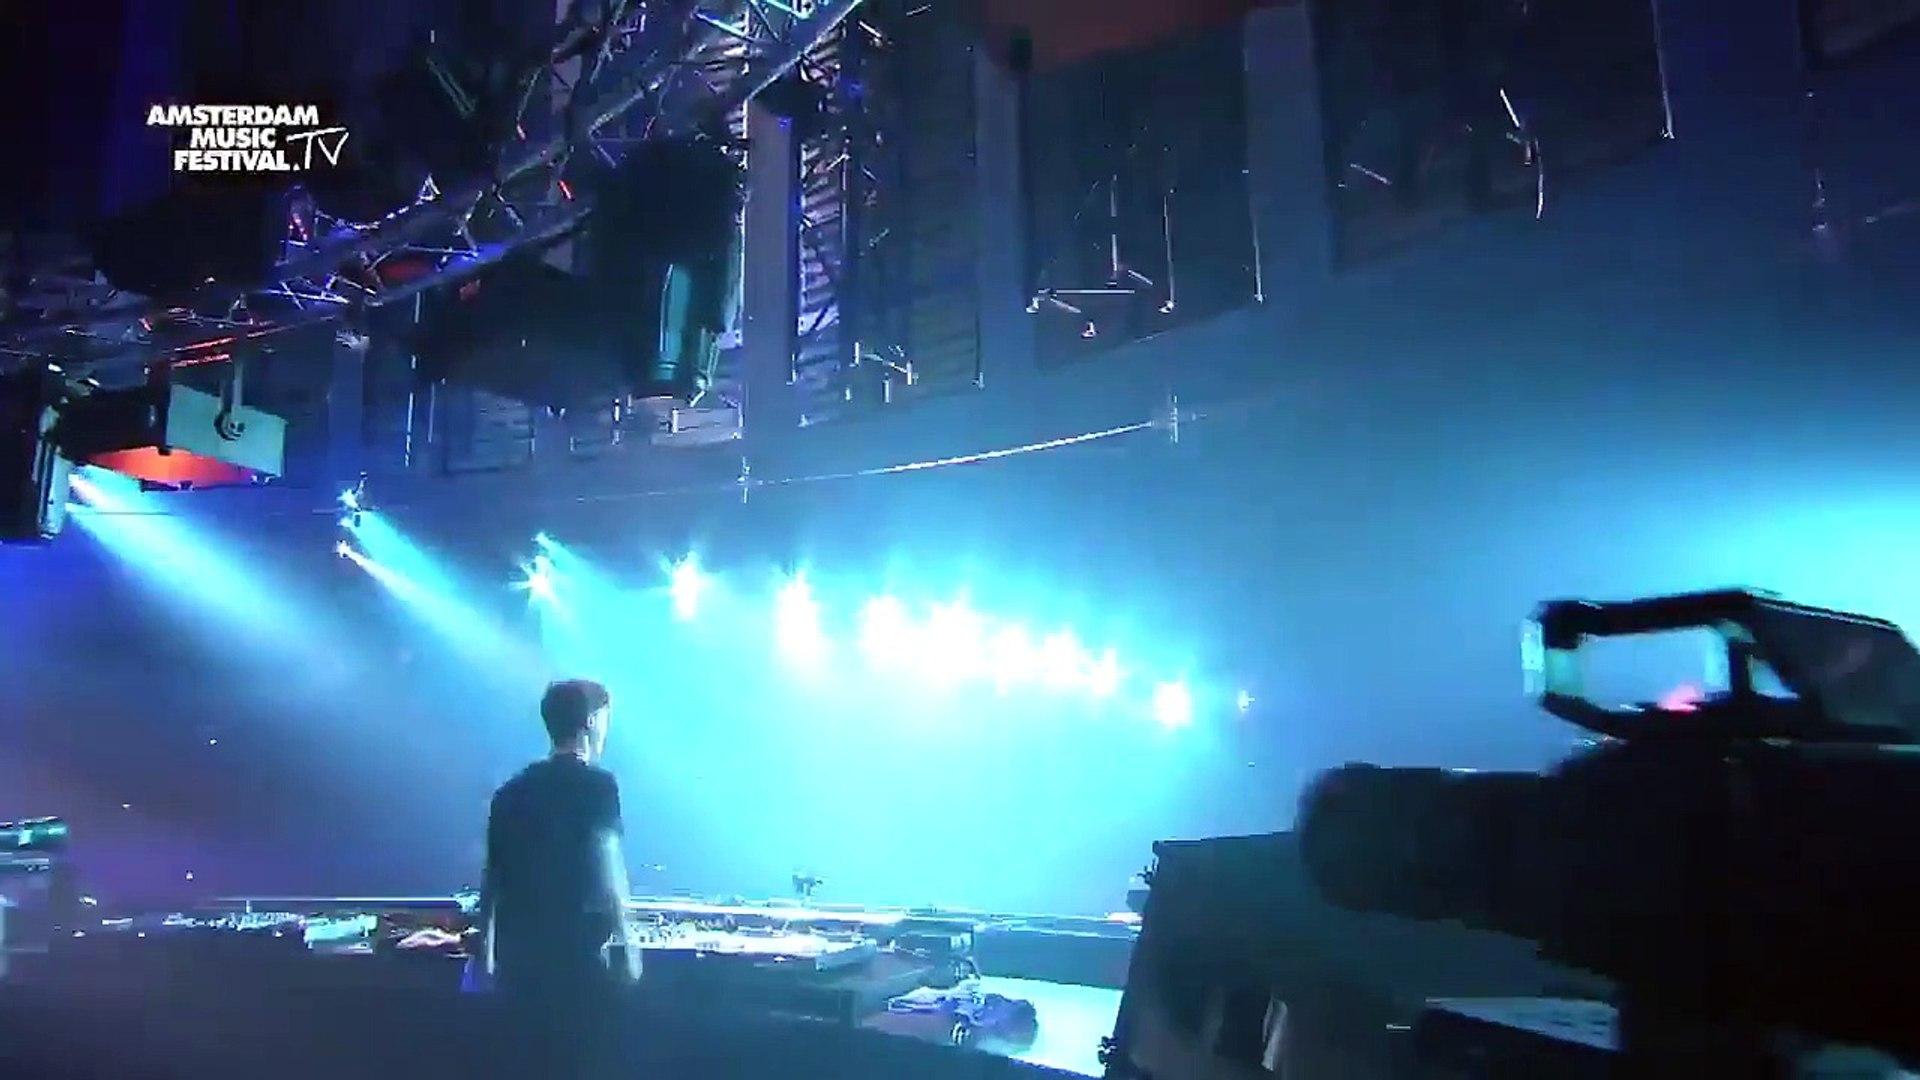 Martin Garrix - Live @ Amsterdam Music Festival 16.10.2015